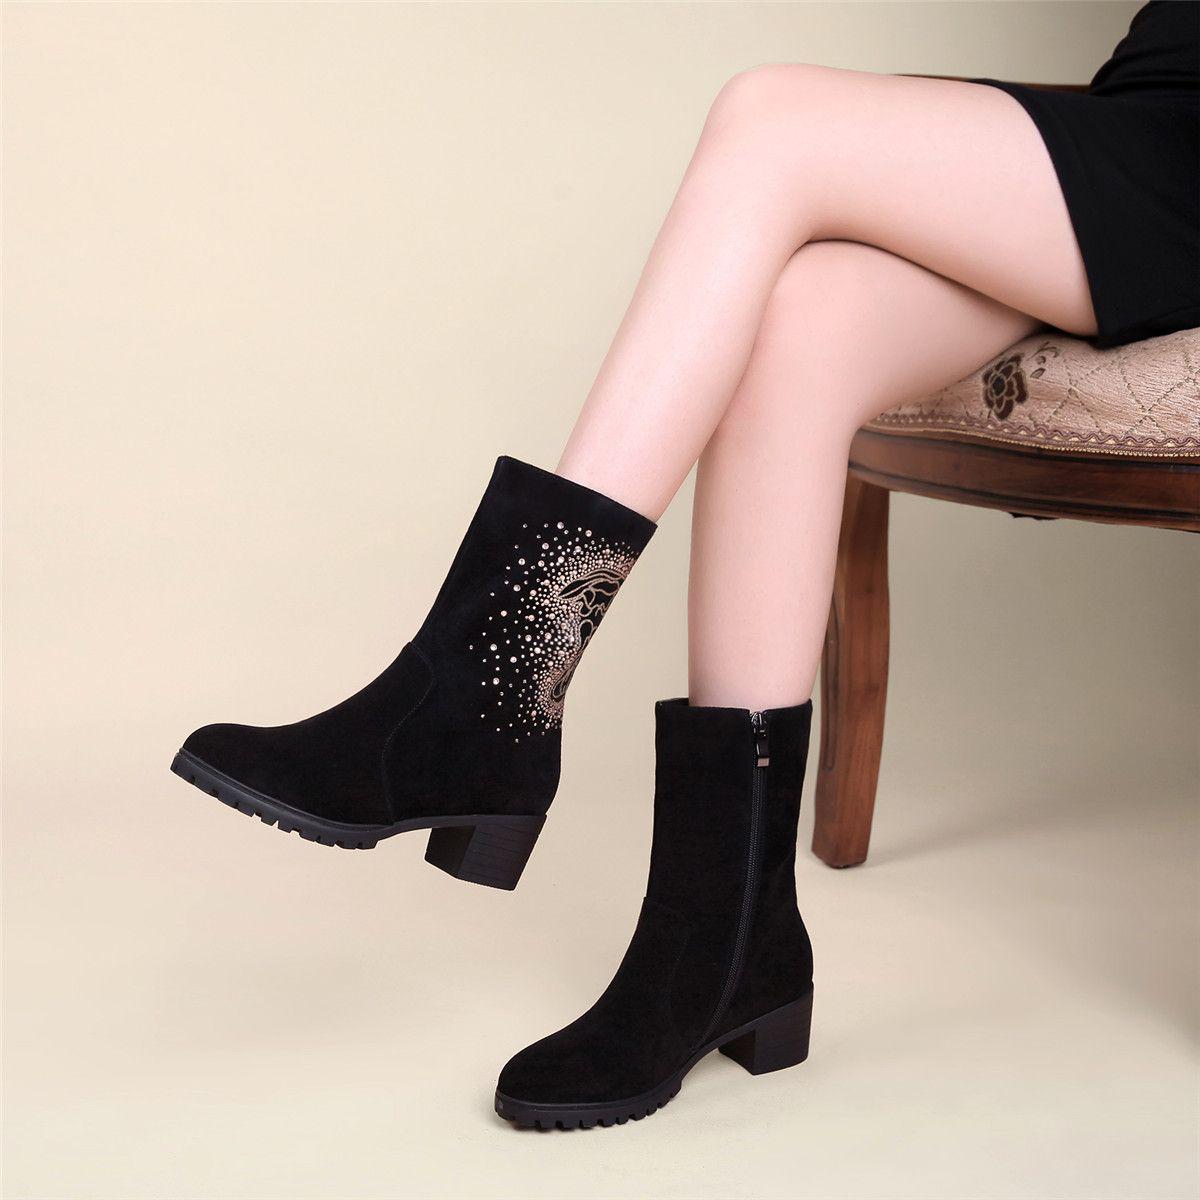 96c7ab1351bf6 Nine Seven Women s Genuine Leather Round Toe Low Heel Black Mid Calf Boot